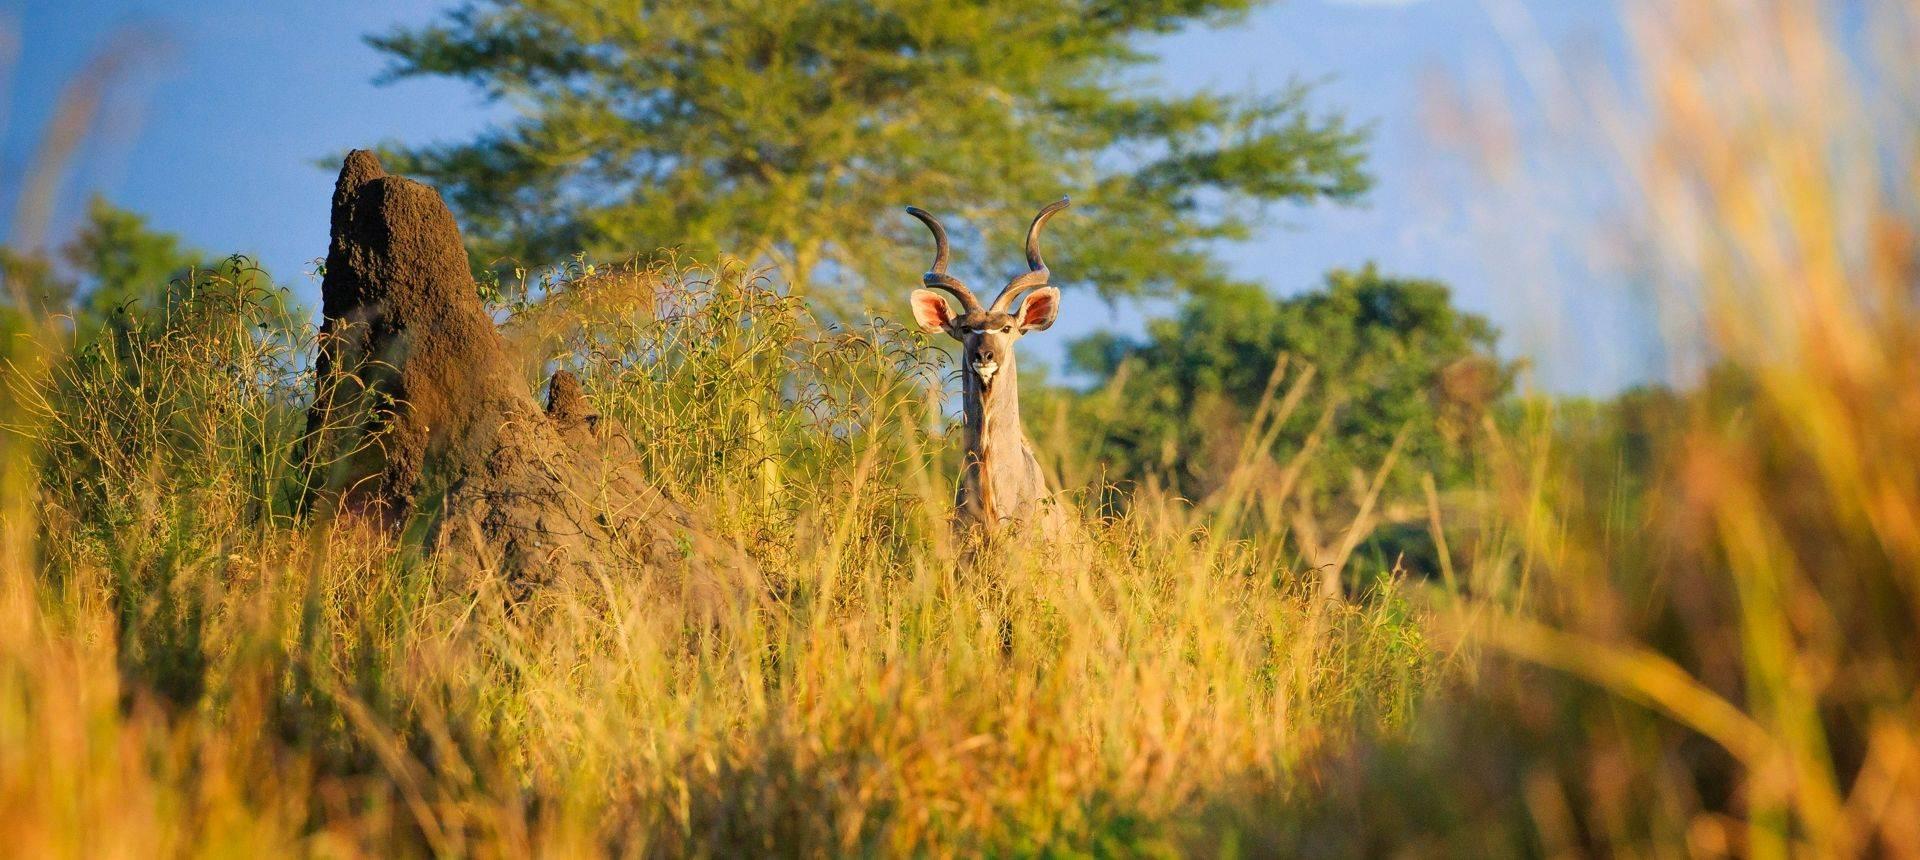 Kudu, Lowonde National Park, Malawi Shutterstock 1098821195